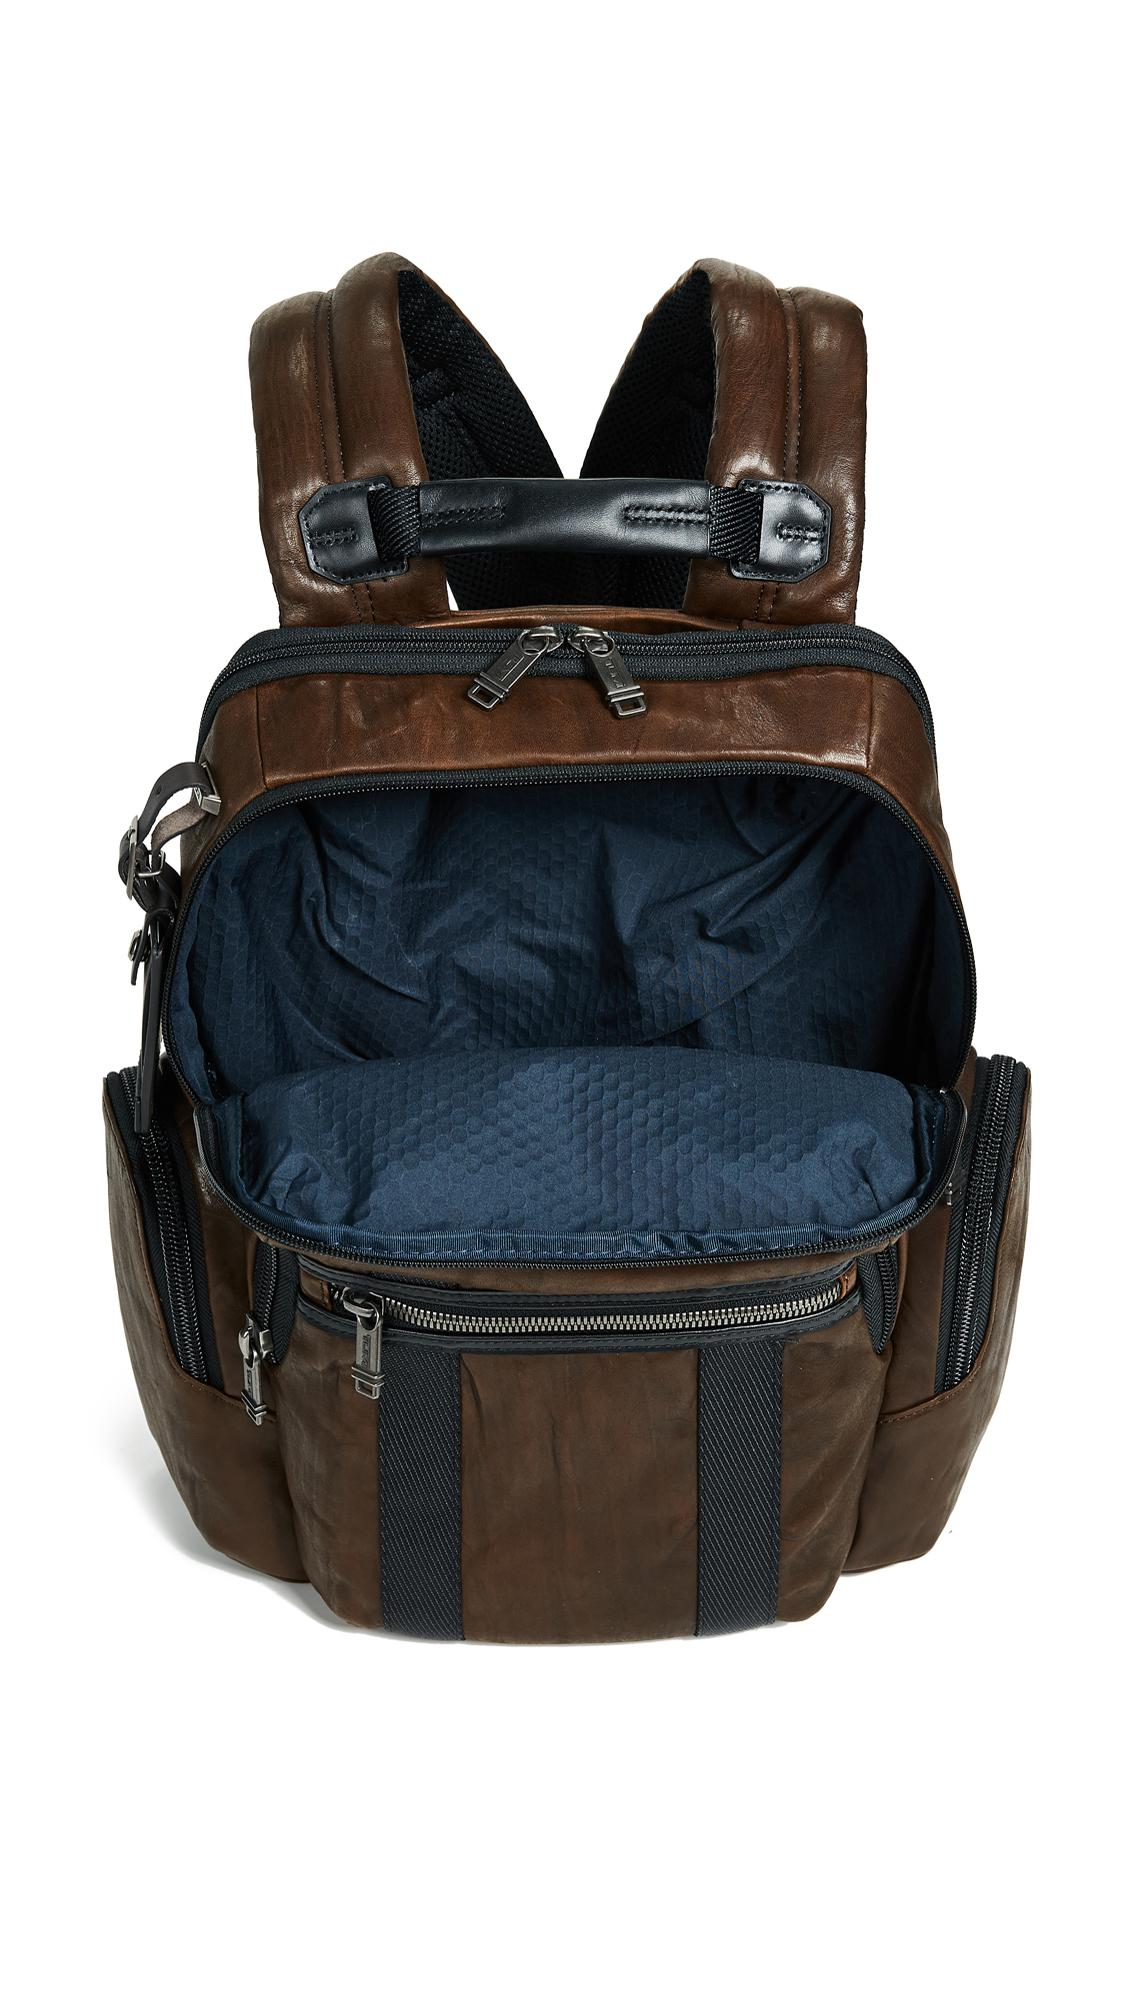 Tumi Leather Alpha Bravo Nellis Backpack in Dark Brown (Brown) for Men